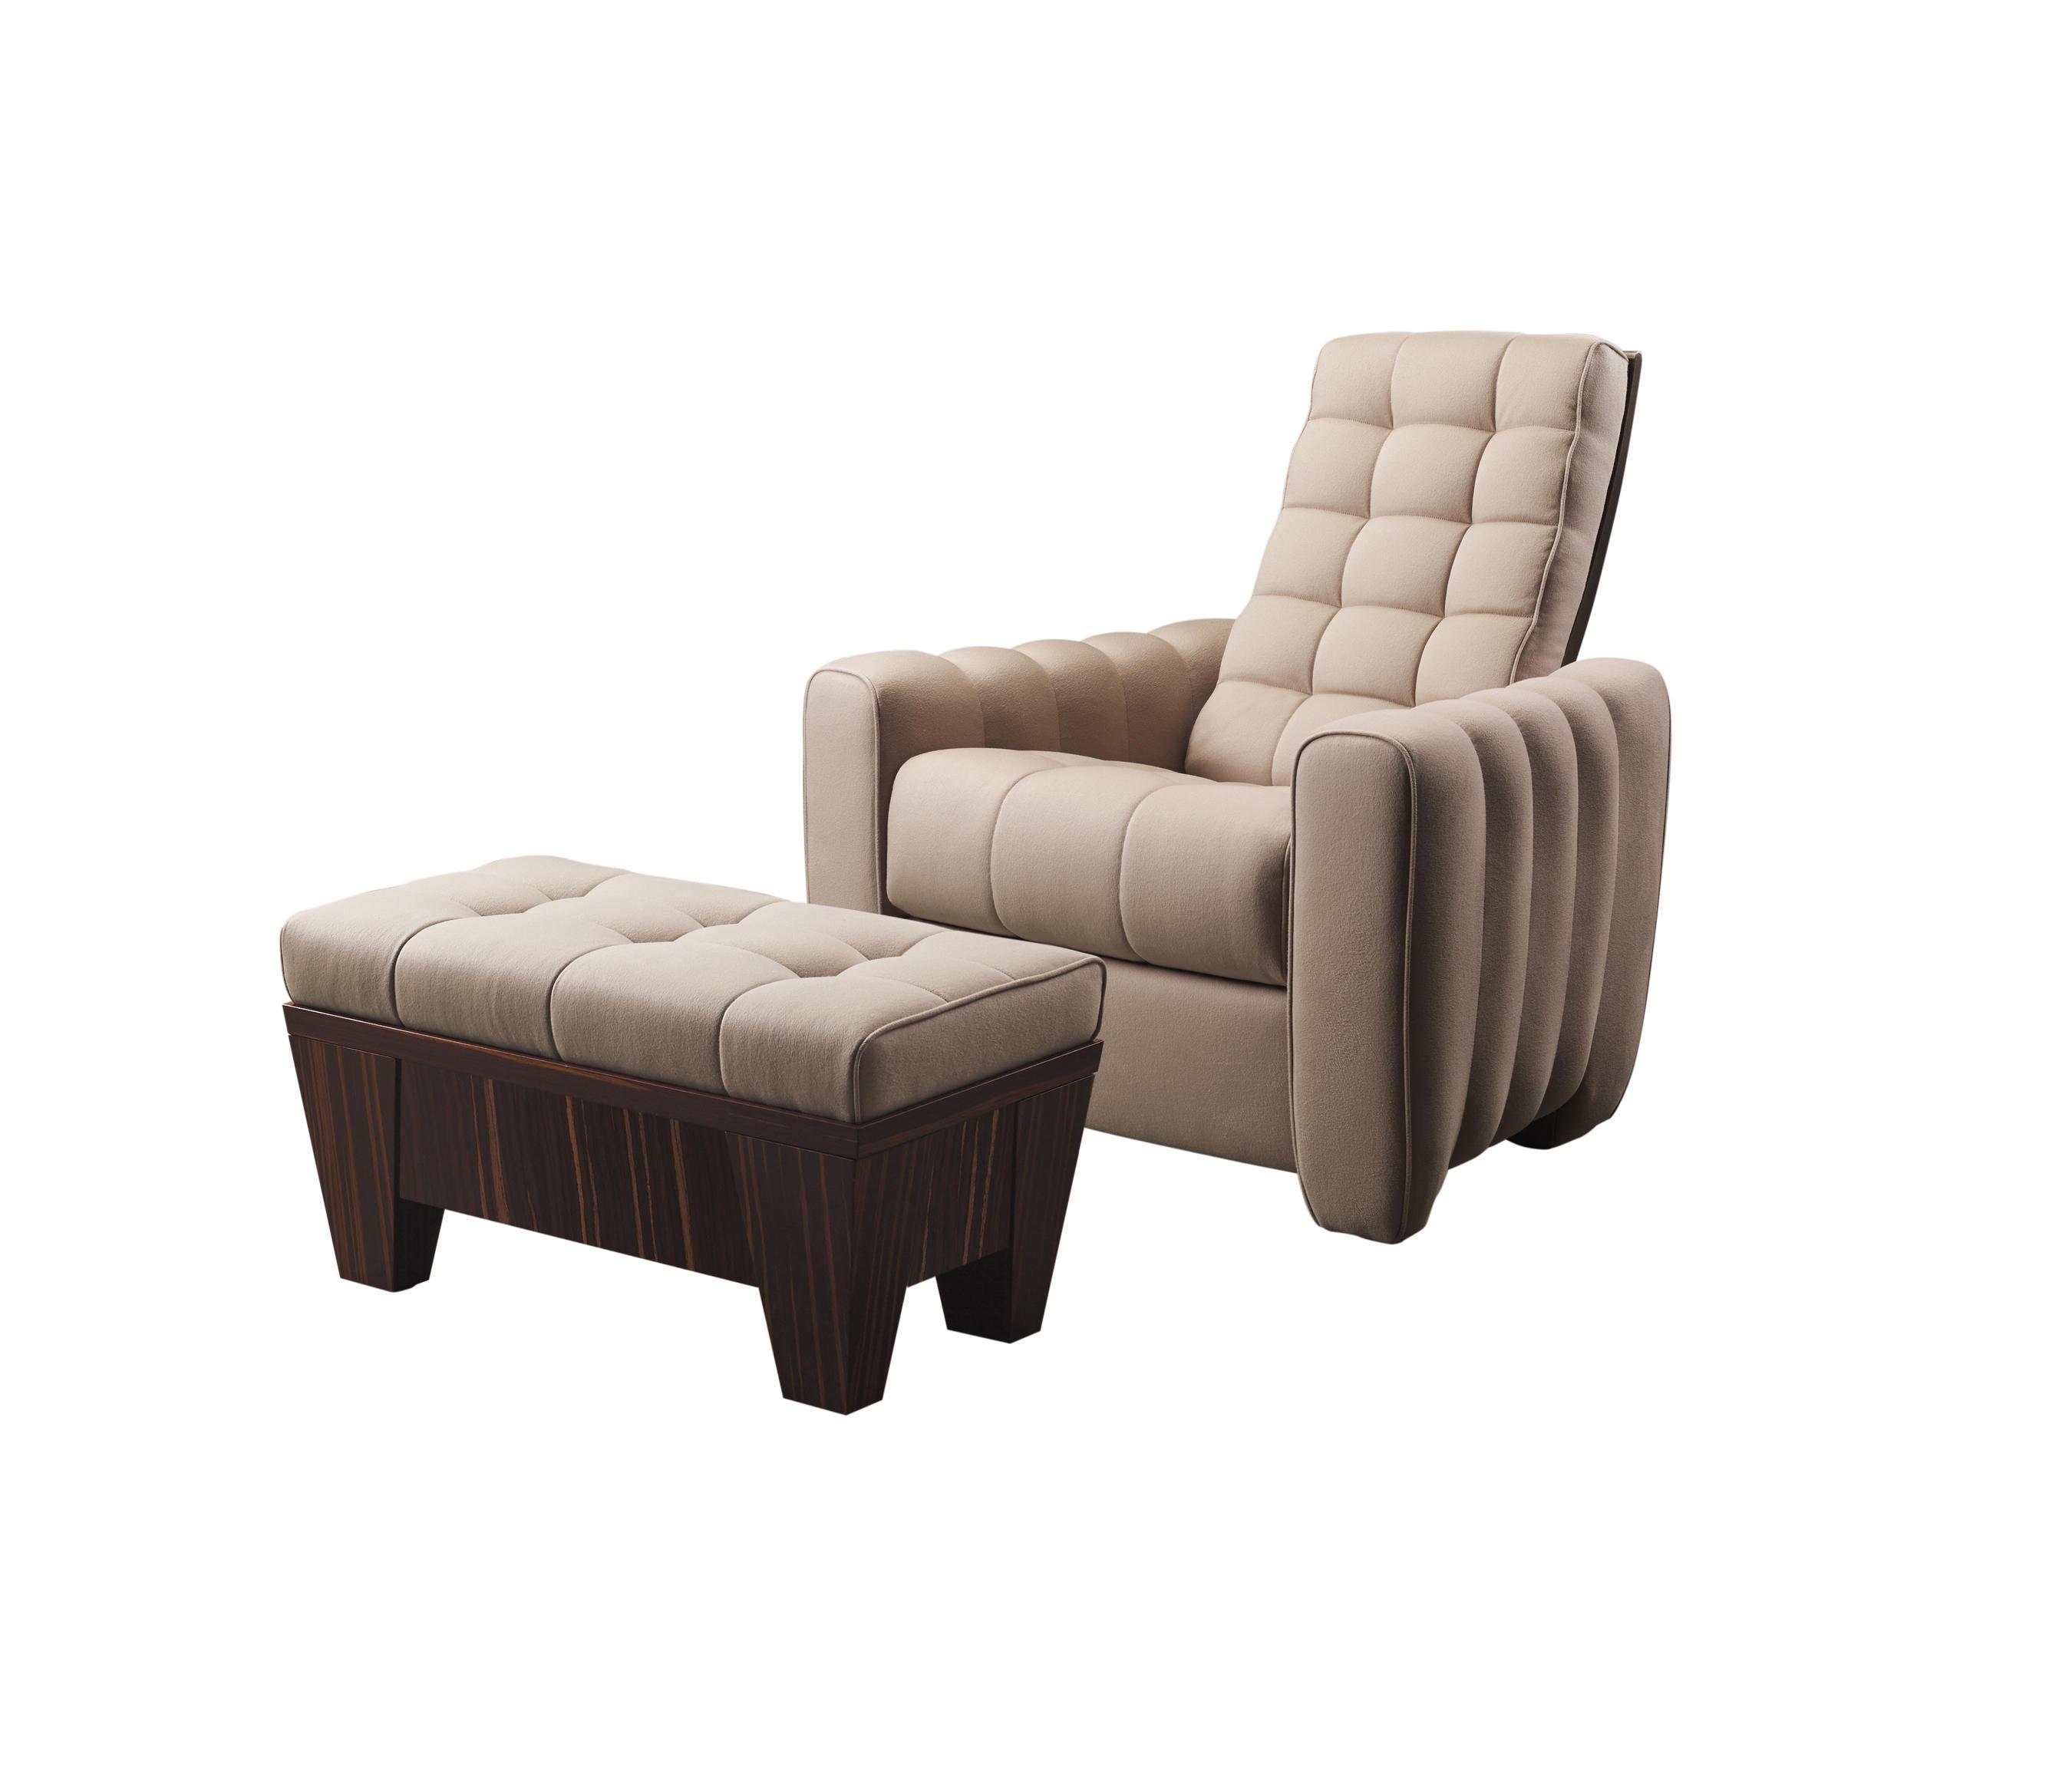 Gertrude reclining armchair by Promemoria | Lounge chairs ...  sc 1 st  Architonic & GERTRUDE RECLINING ARMCHAIR - Lounge chairs from Promemoria ... islam-shia.org